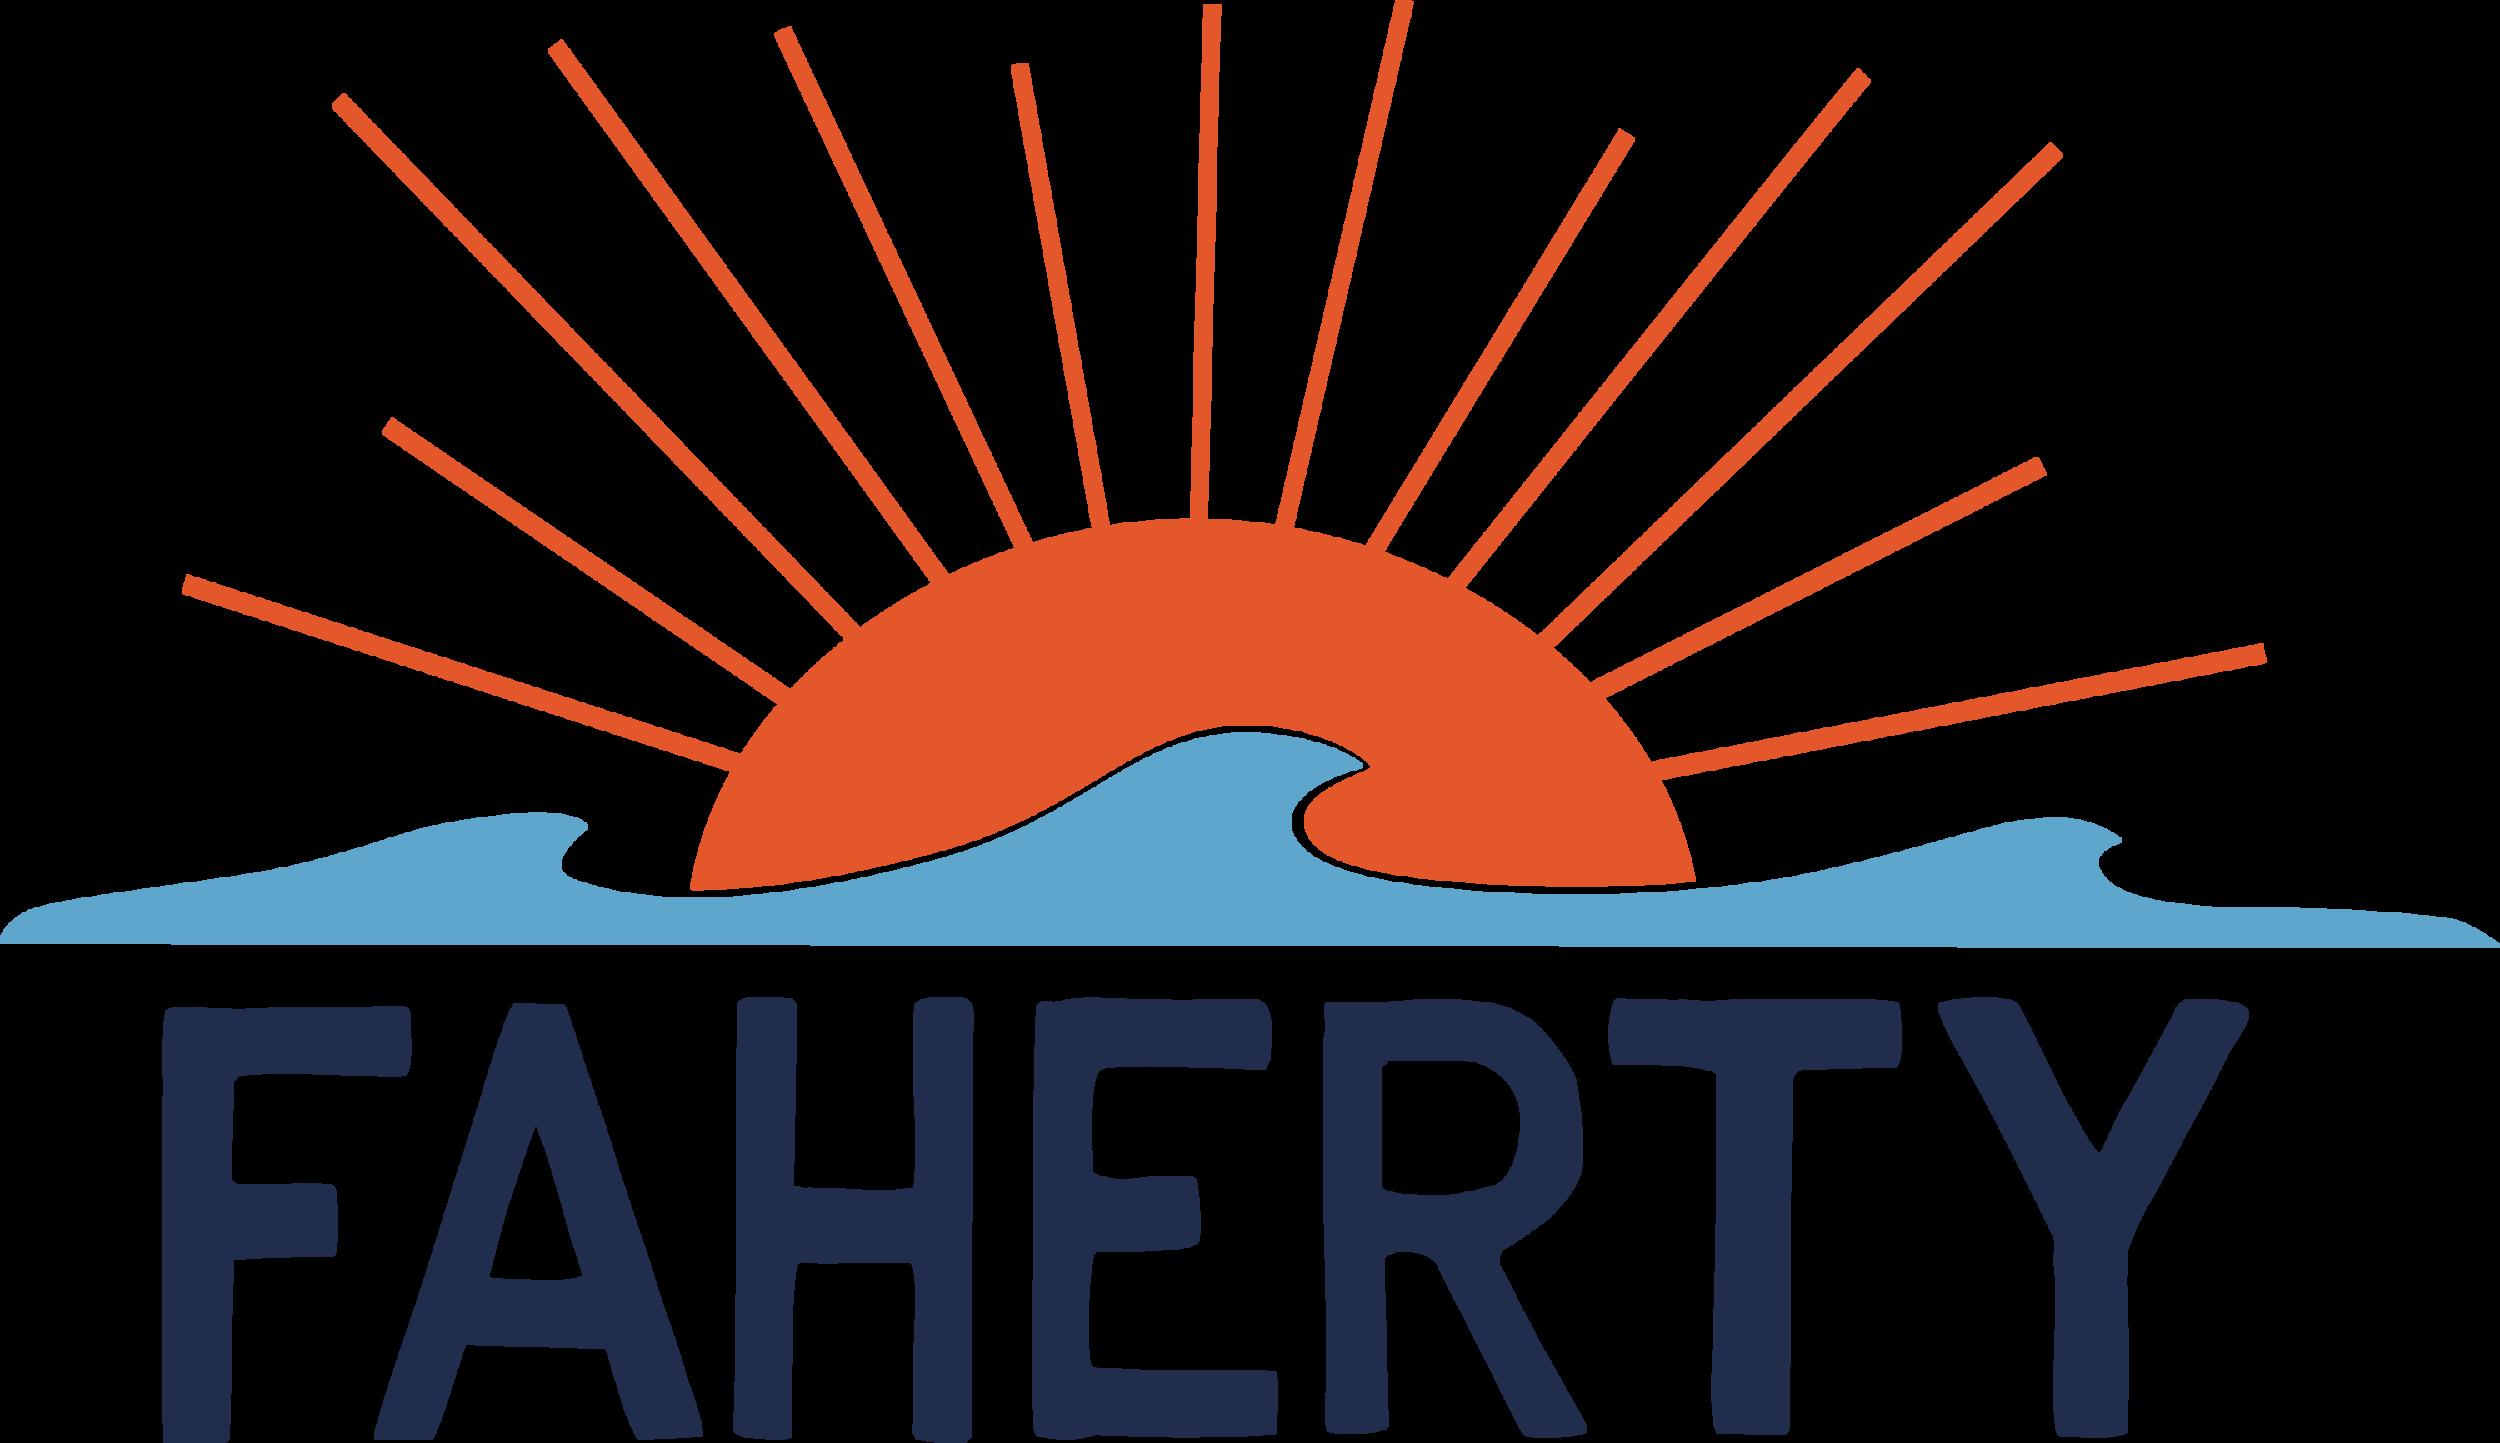 1cf.FAHERTY_logo_FC.png